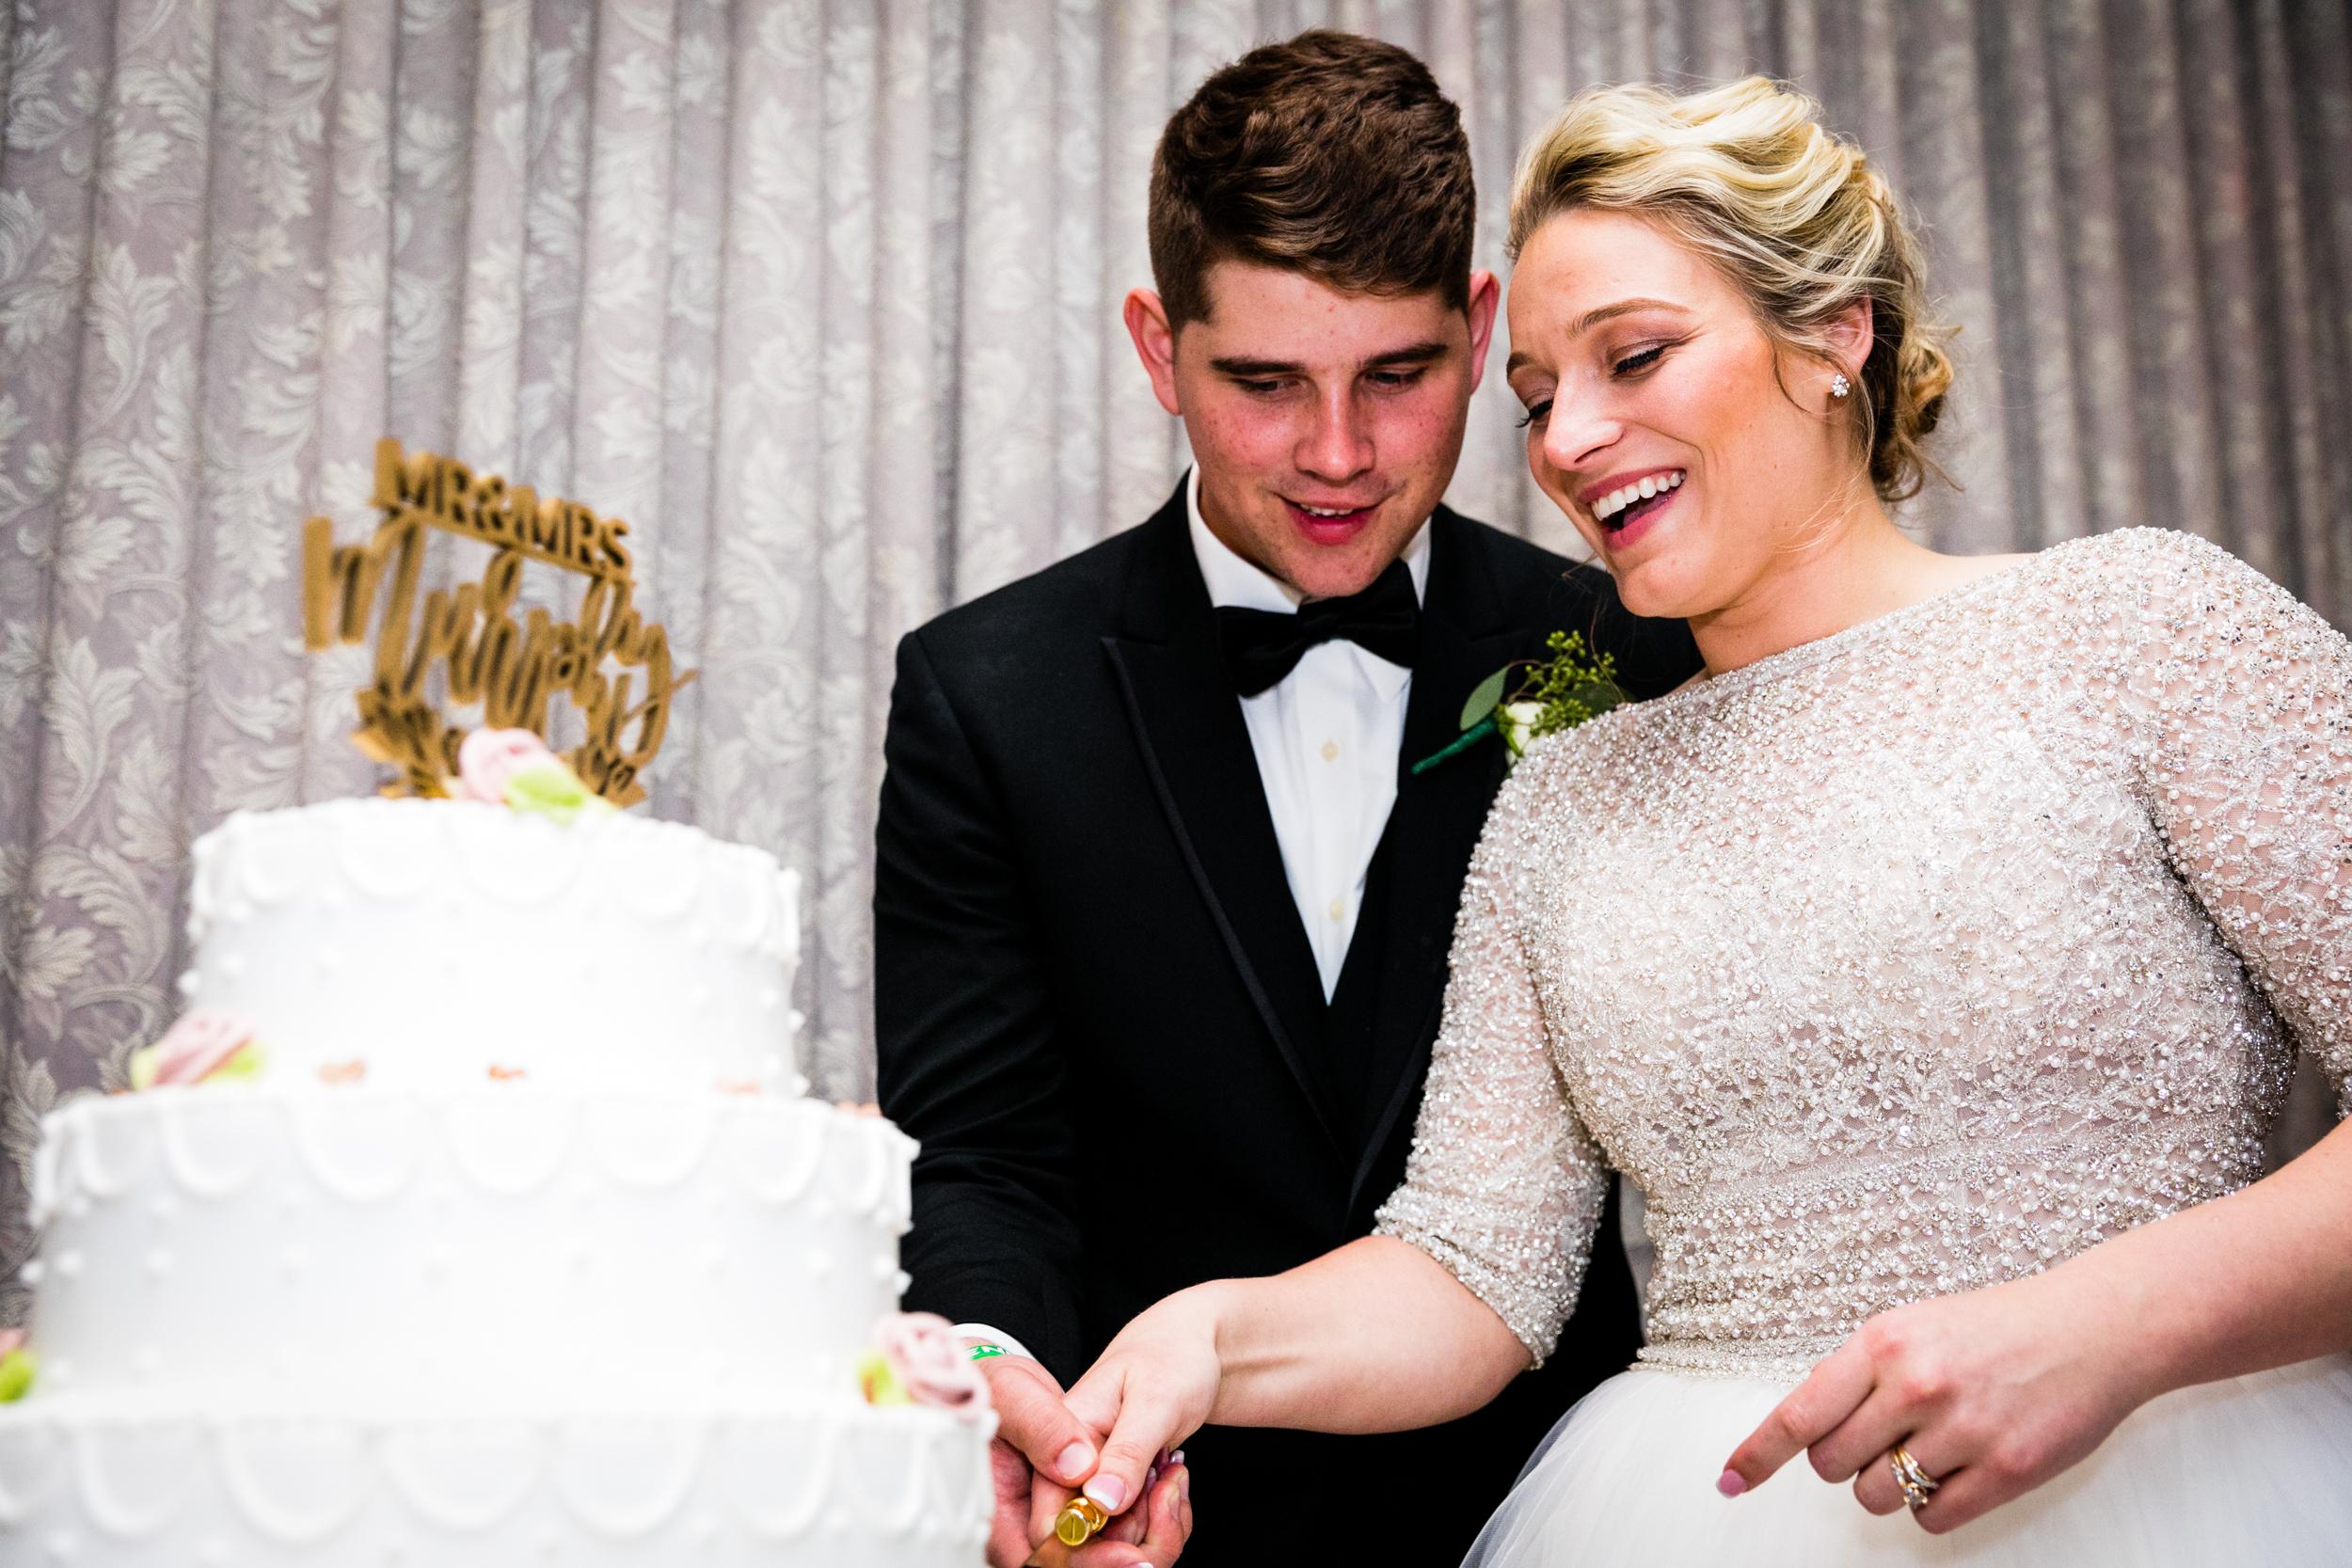 CELEBRATIONS BENSALEM WEDDING PHOTOGRAPHY-100.jpg